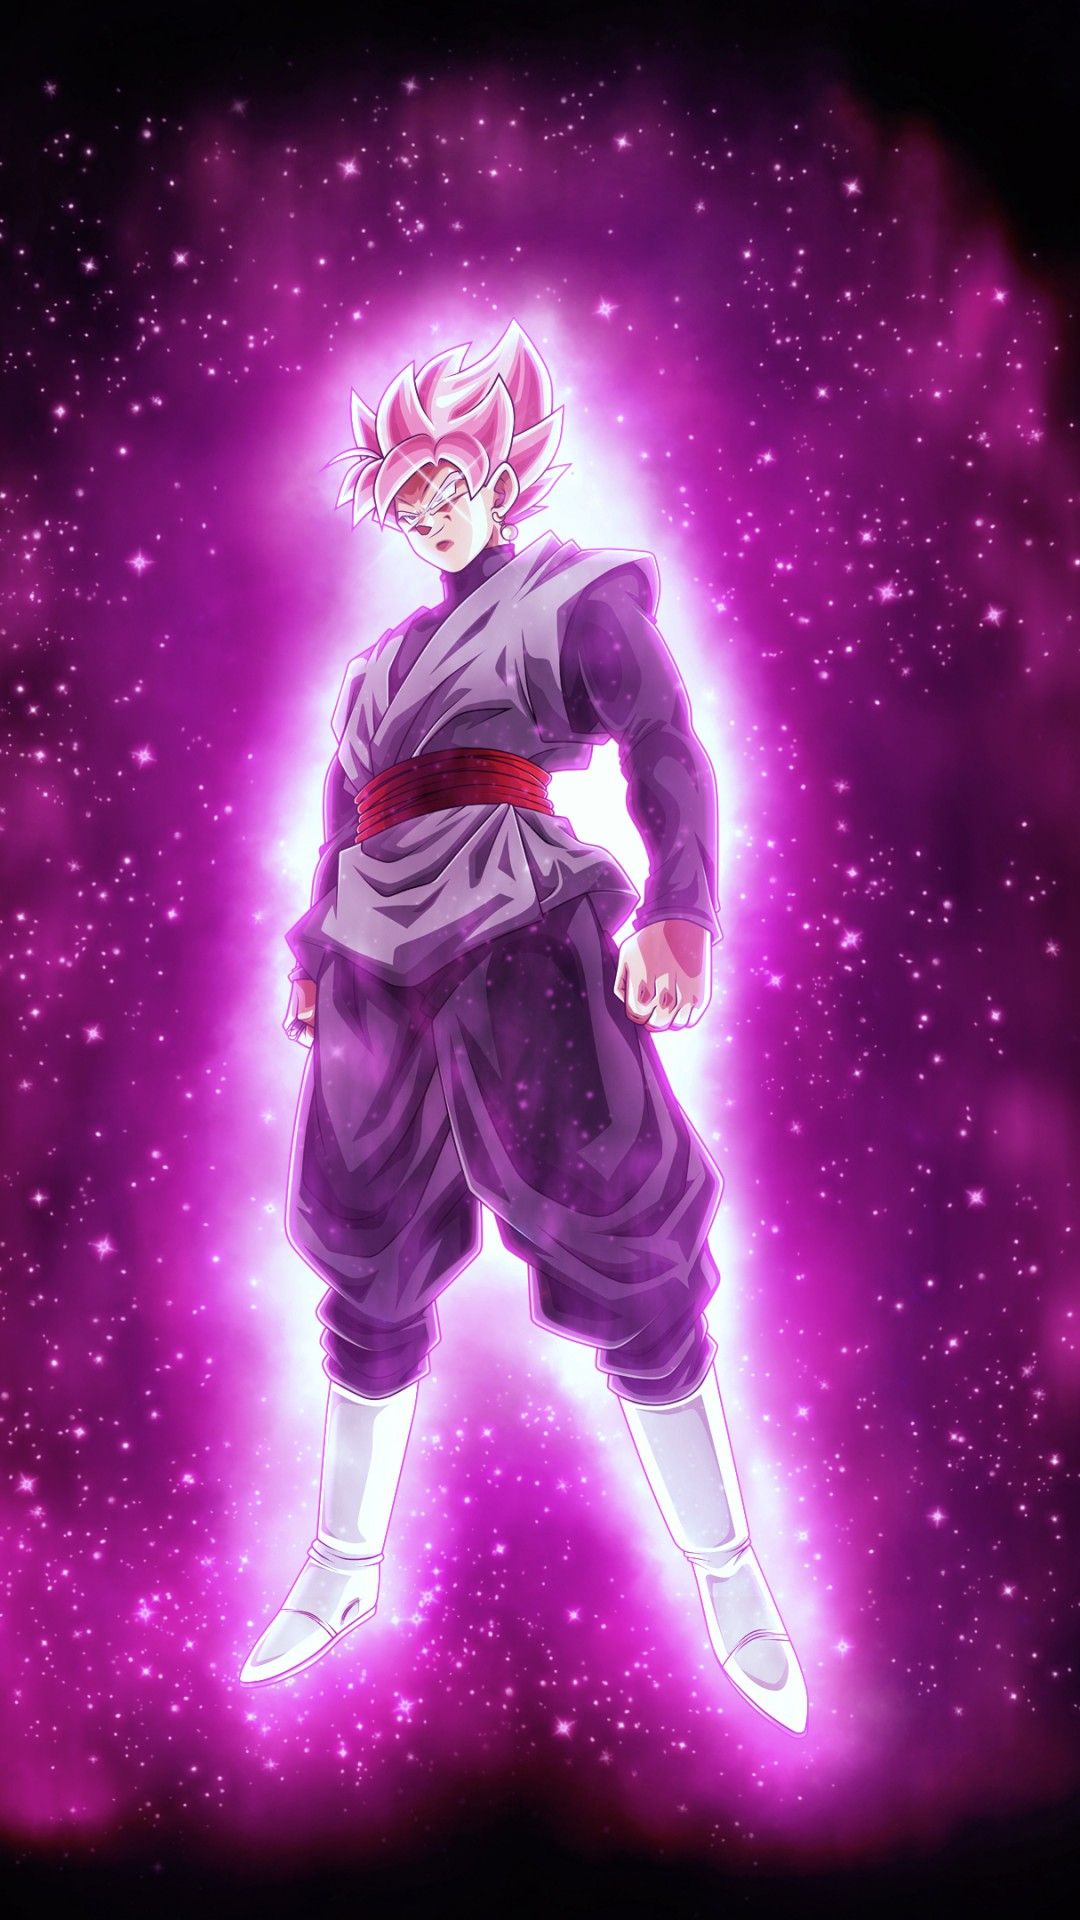 Black Goku Wallpaper Android Black Goku Dragon Ball Super